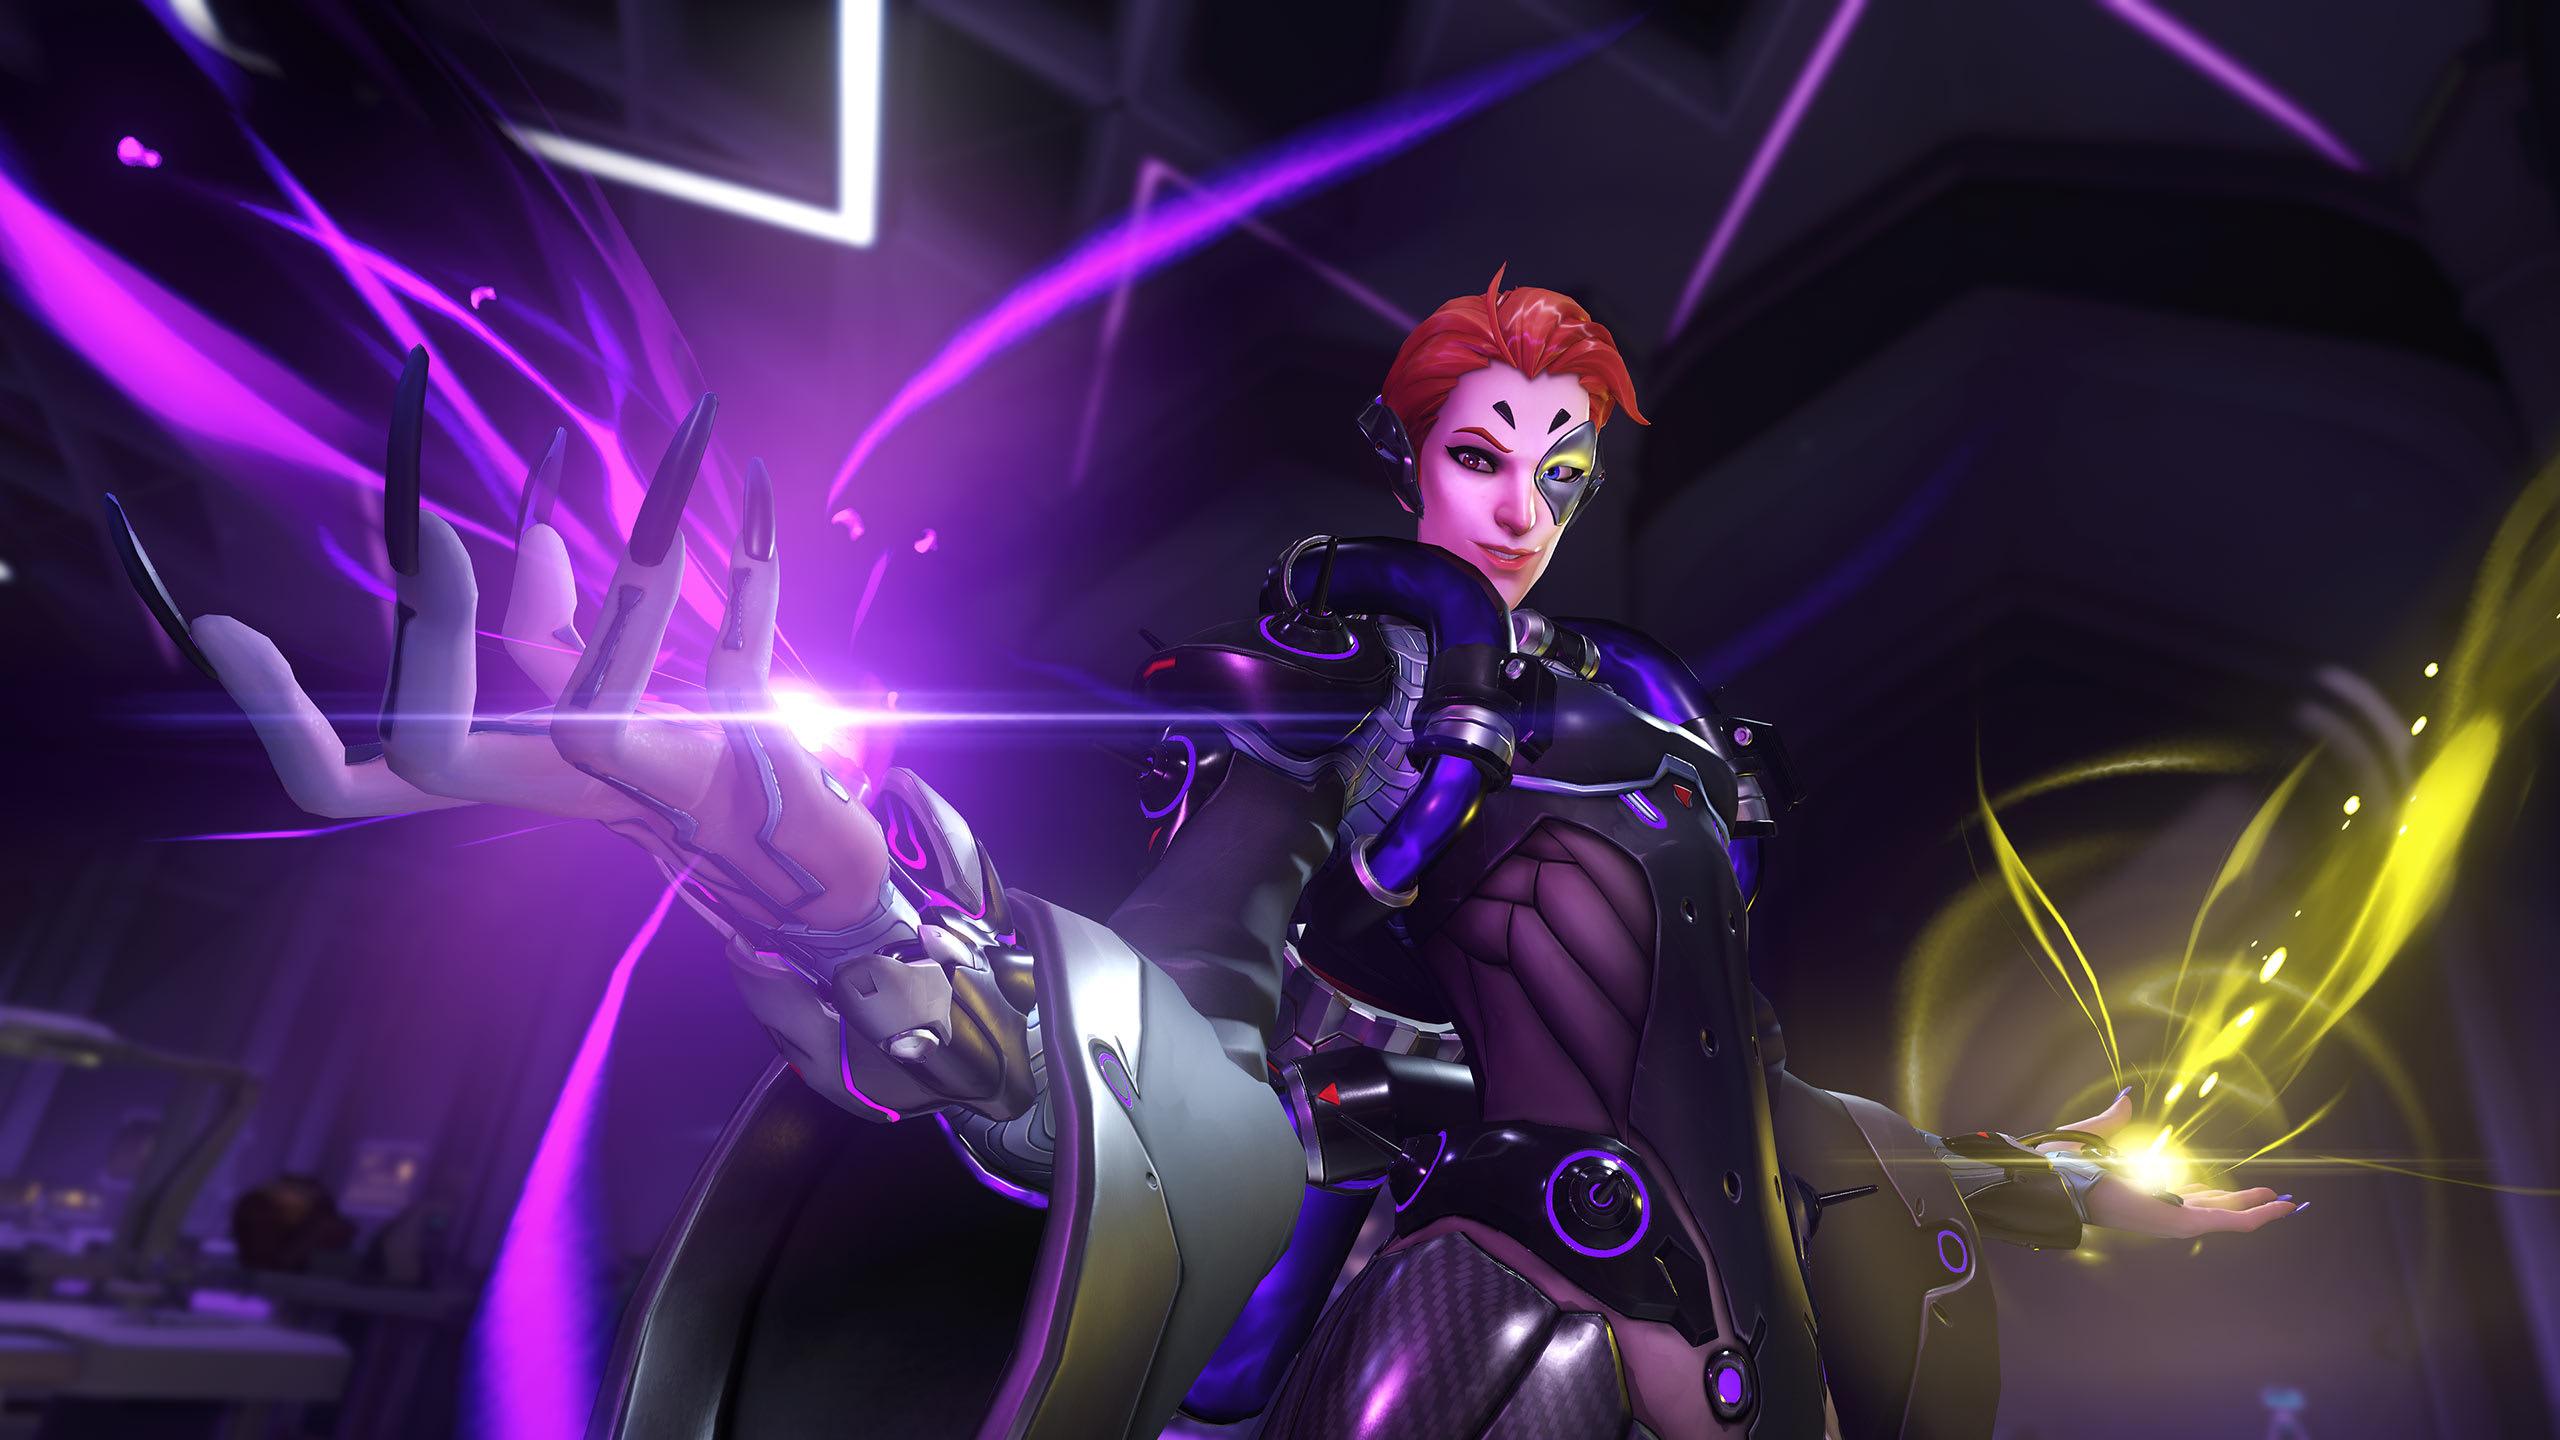 Overwatch Best Healer 2020 Overwatch' gets a new healer hero and another map